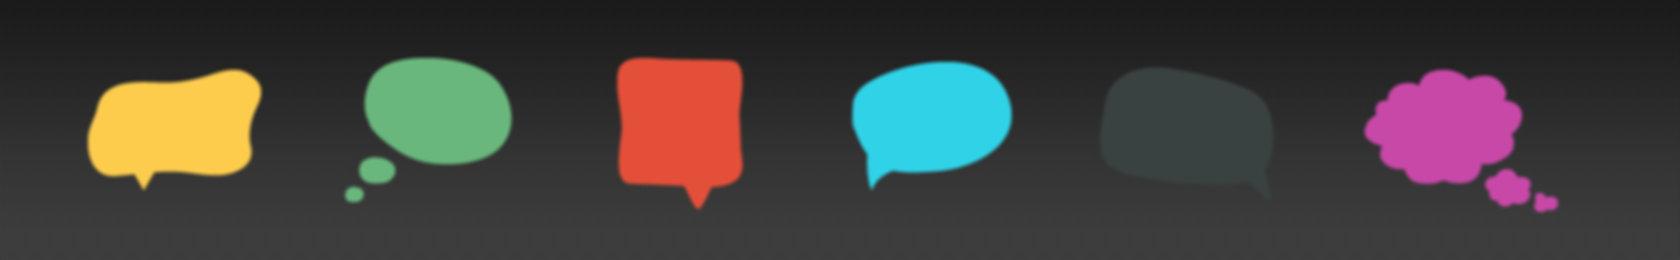 Marketing, Kommunikation, Event Consulting